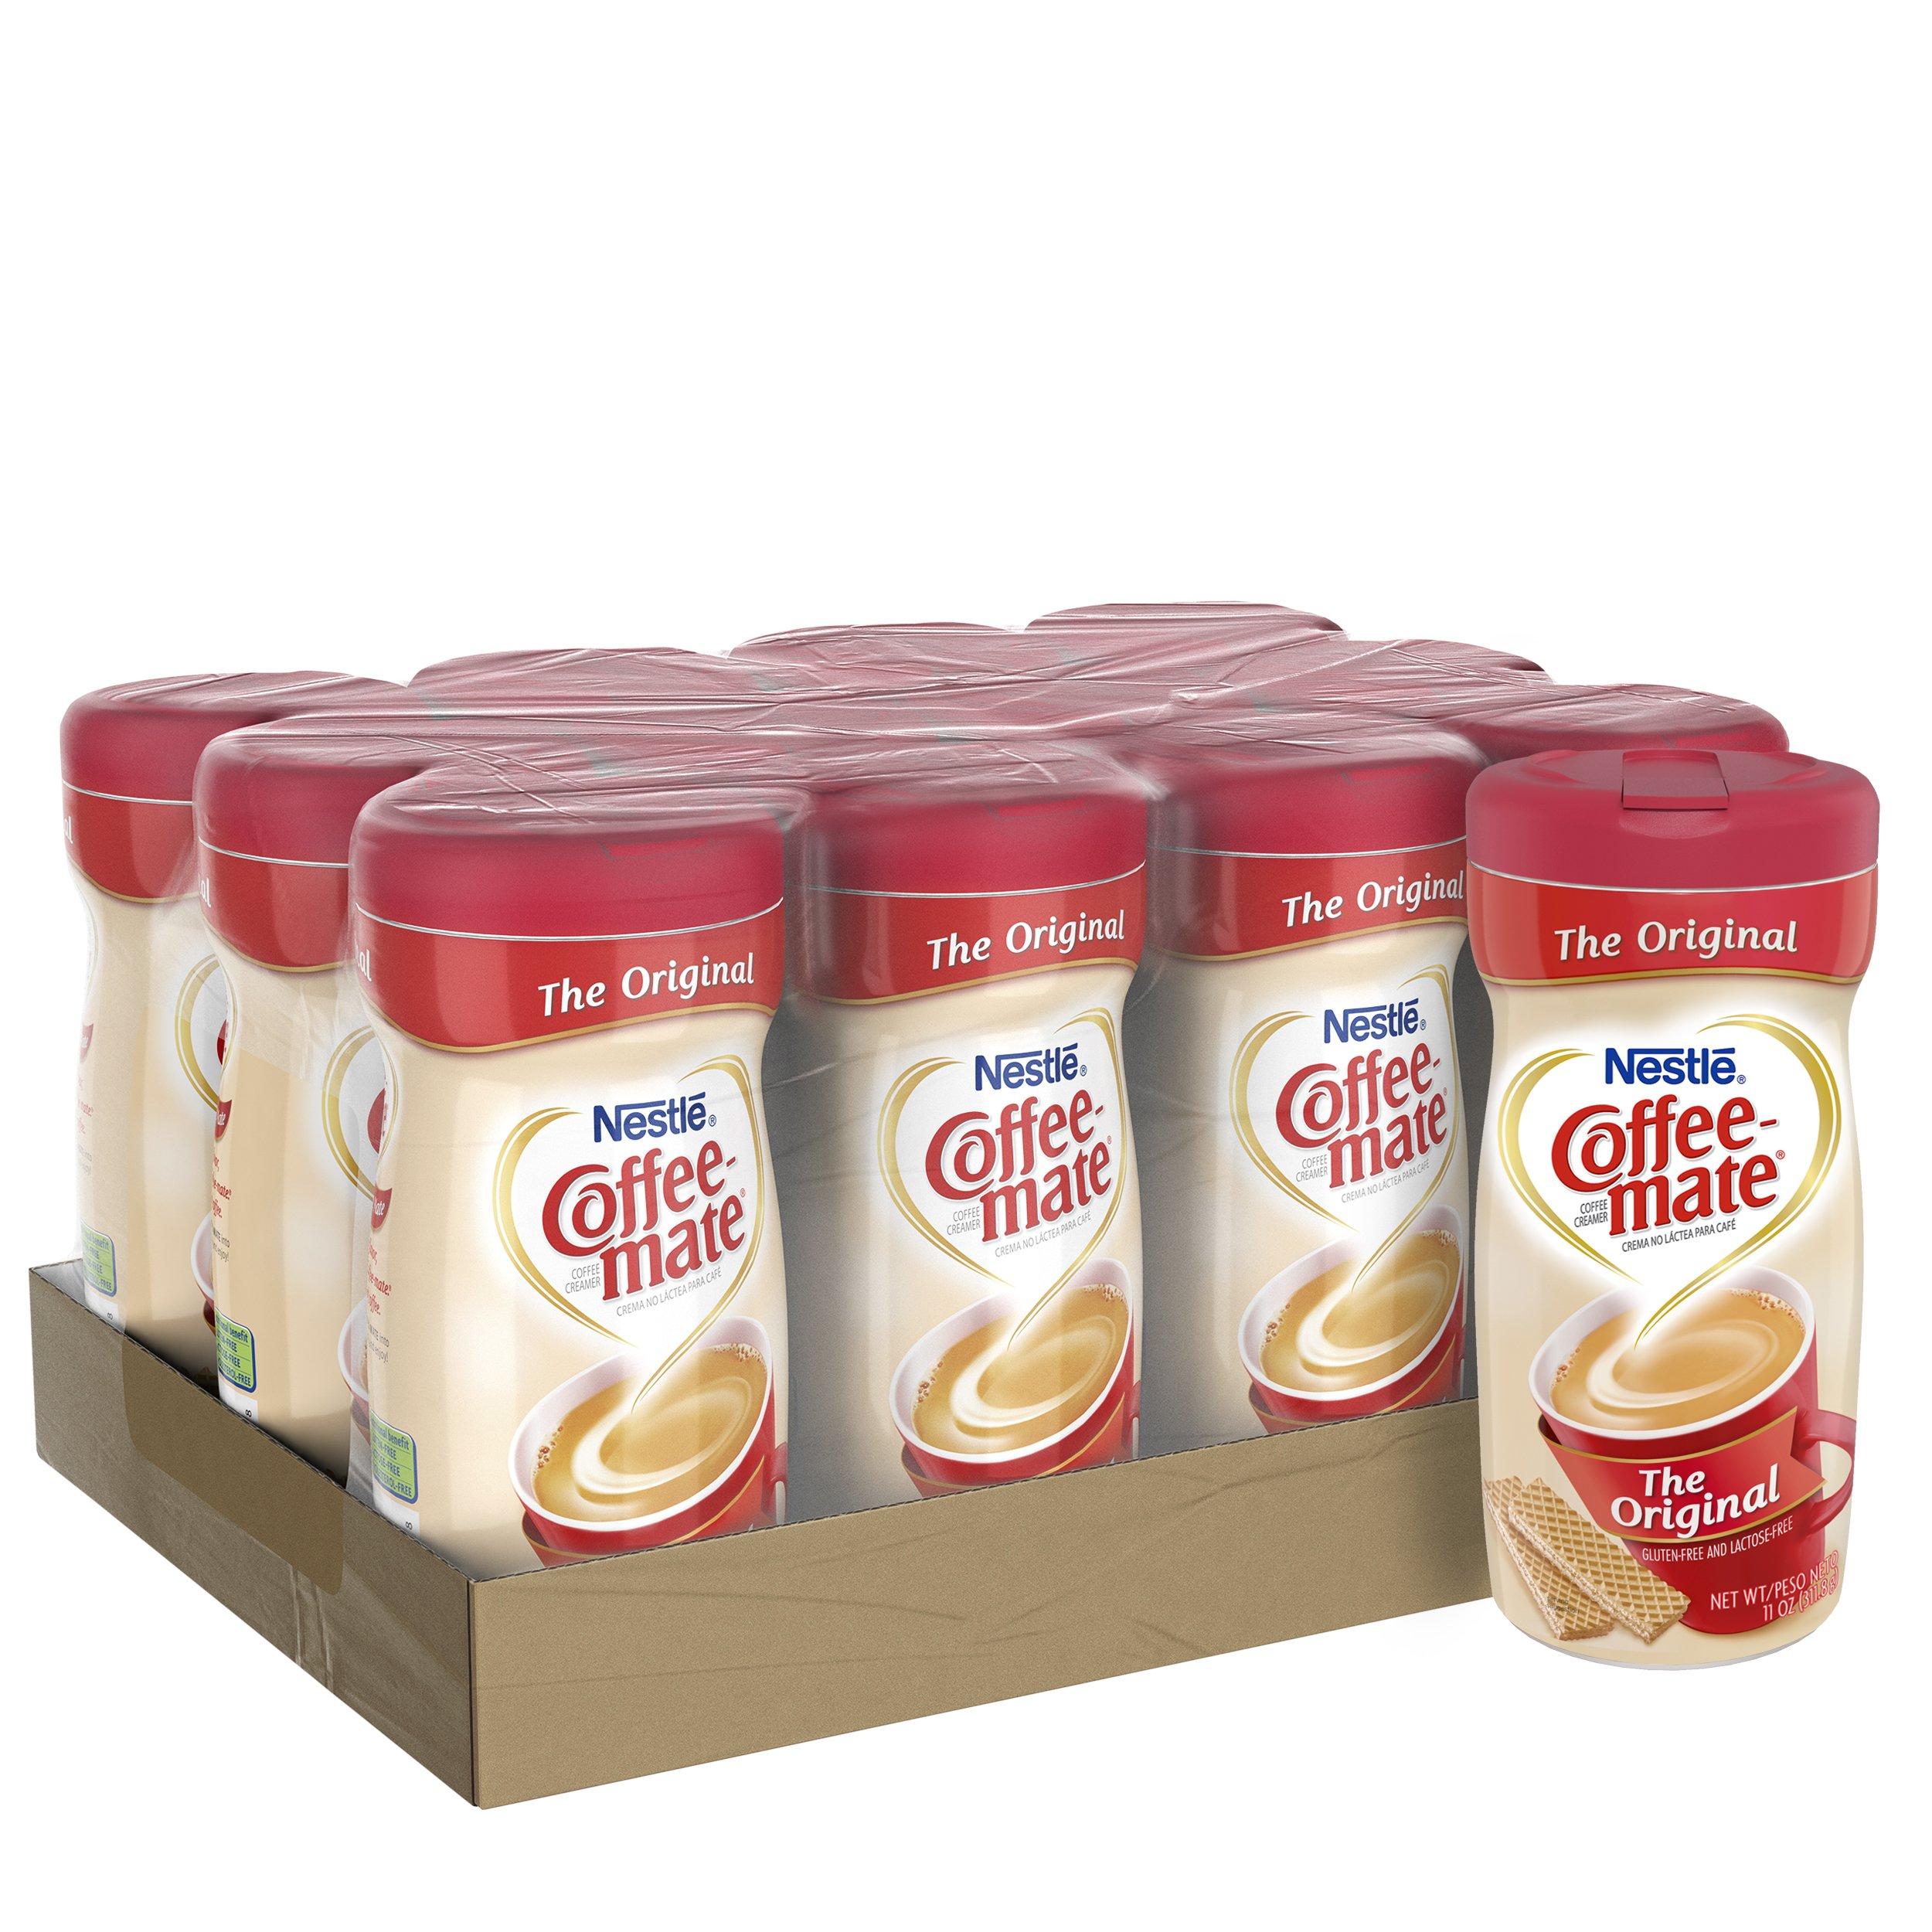 NESTLE COFFEE-MATE Coffee Creamer, Original, 11oz powder creamer, Pack of 12 by Nestle Coffee Mate